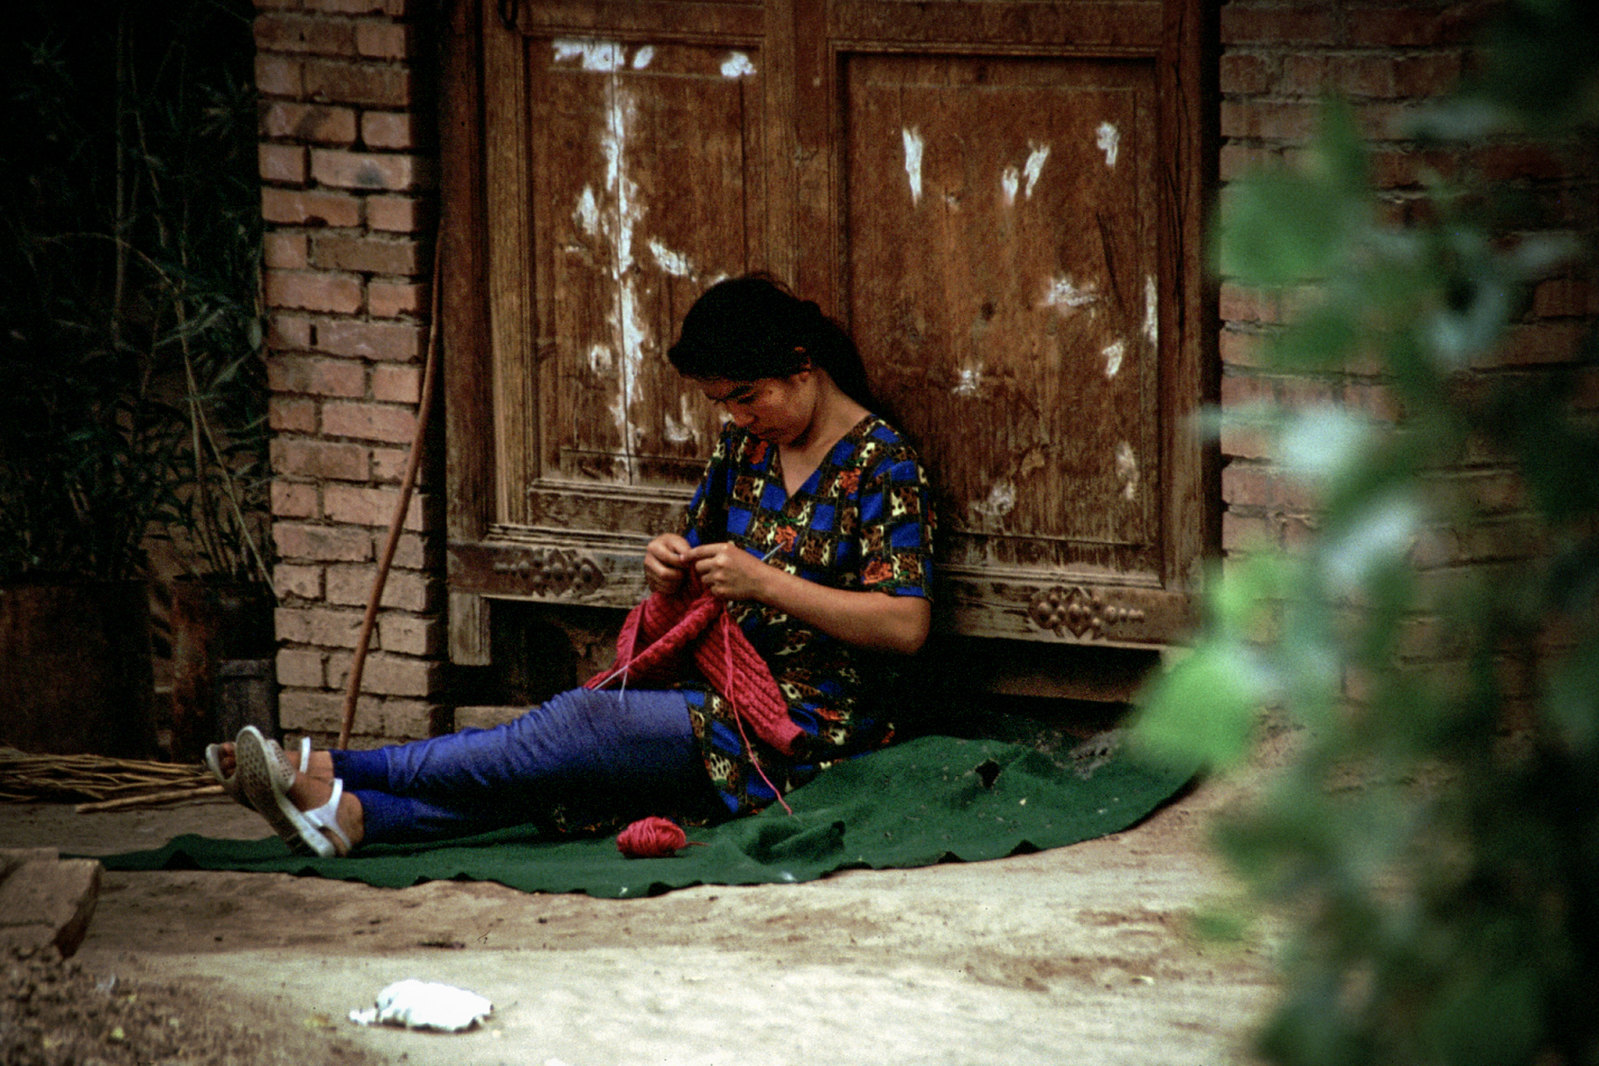 Turpan - Province du Xinjiang - La tricoteuse